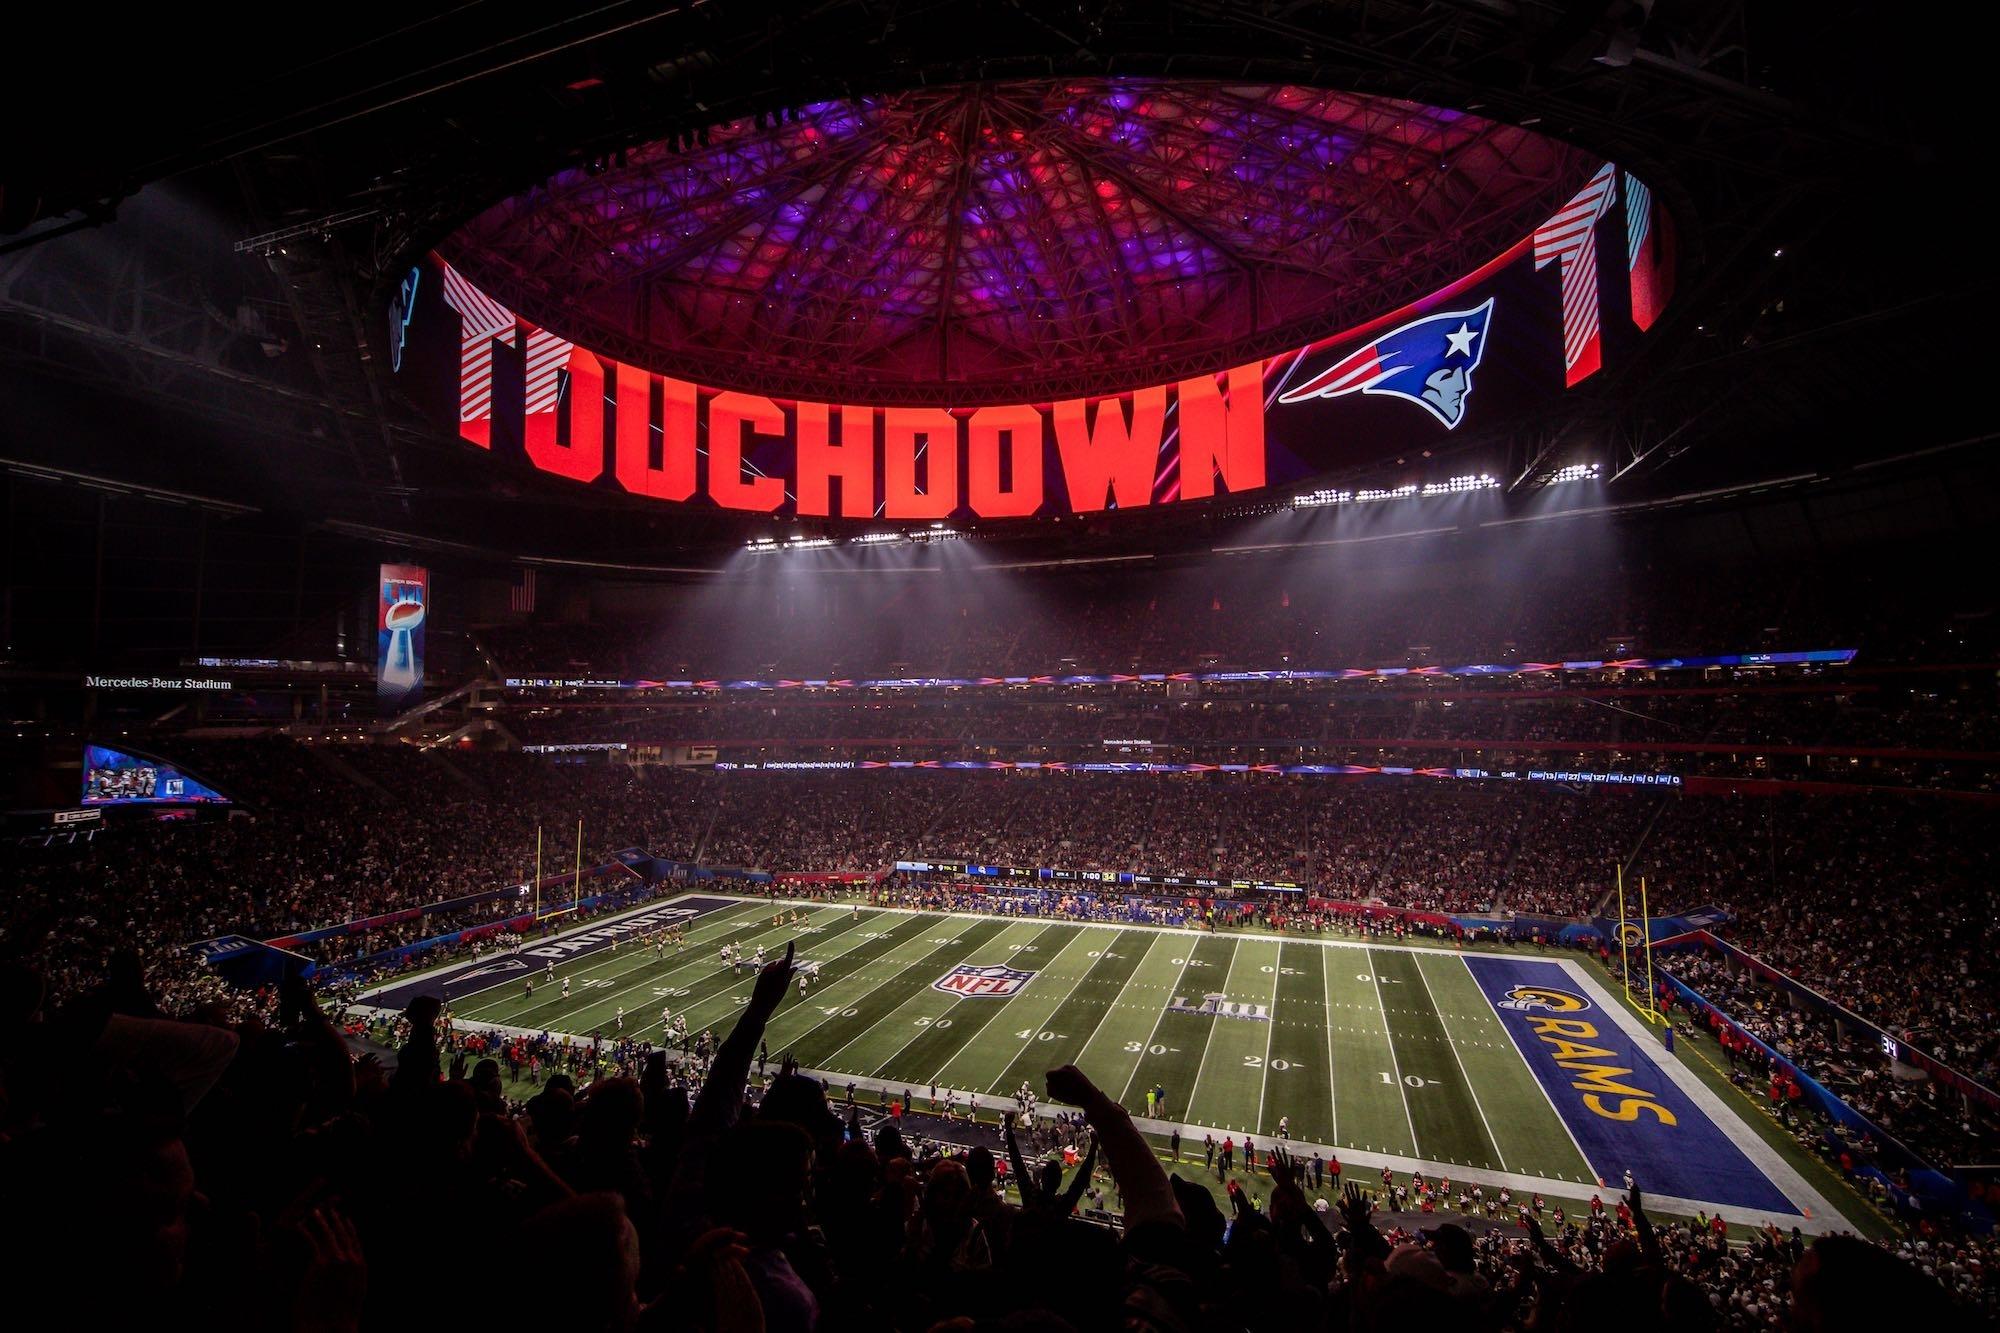 Super Bowl Liii - Mercedes Benz Stadium with regard to Super Bowl Liii Seating Chart